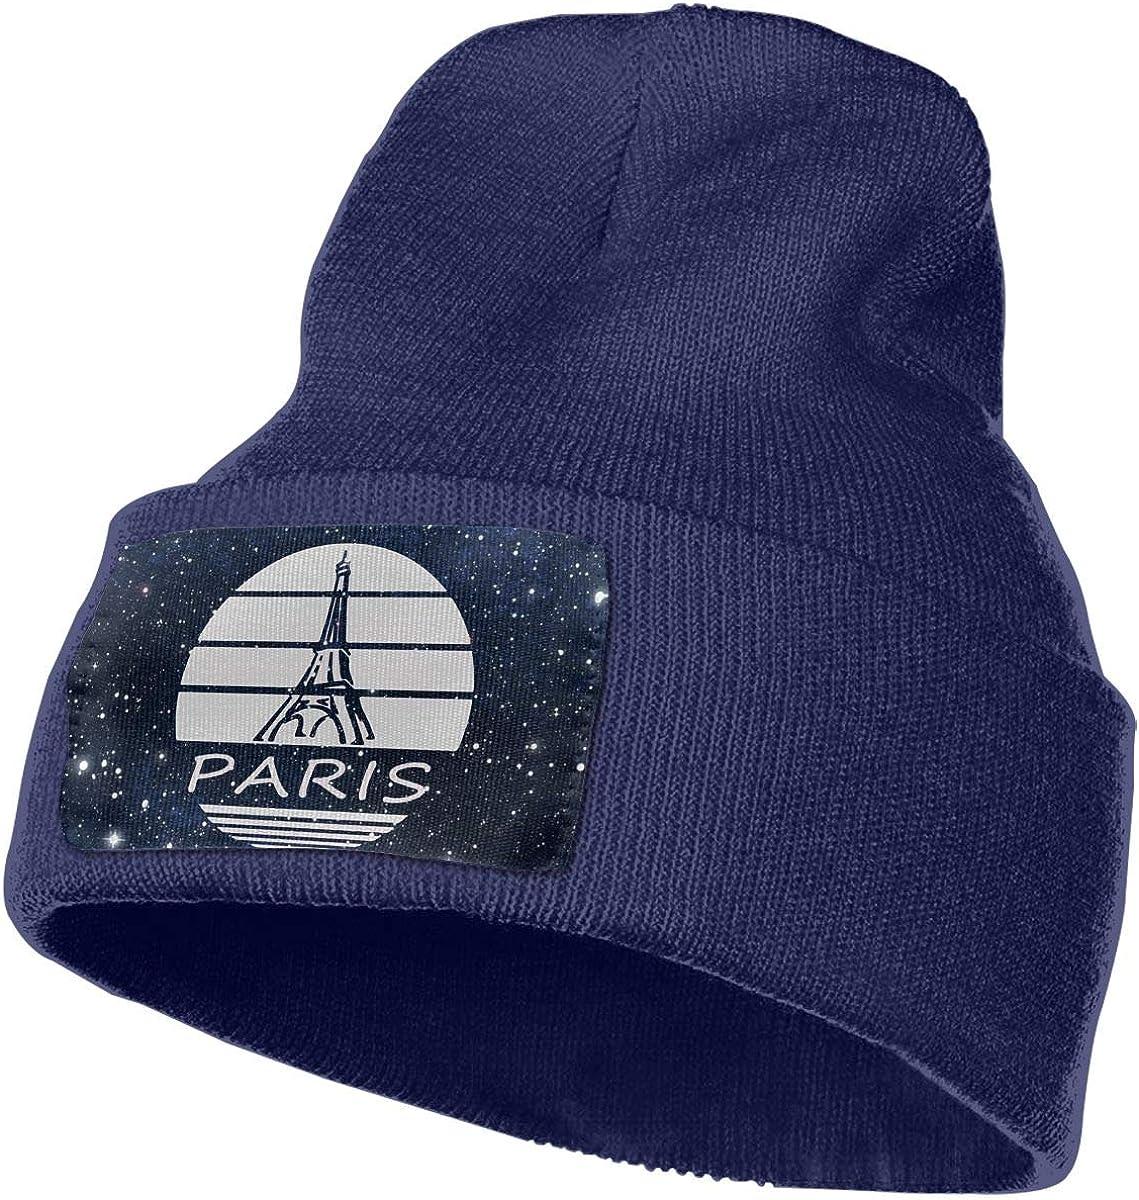 Paris Eiffel Tower Men /& Women Skull Caps Winter Warm Stretchy Knitting Beanie Hats